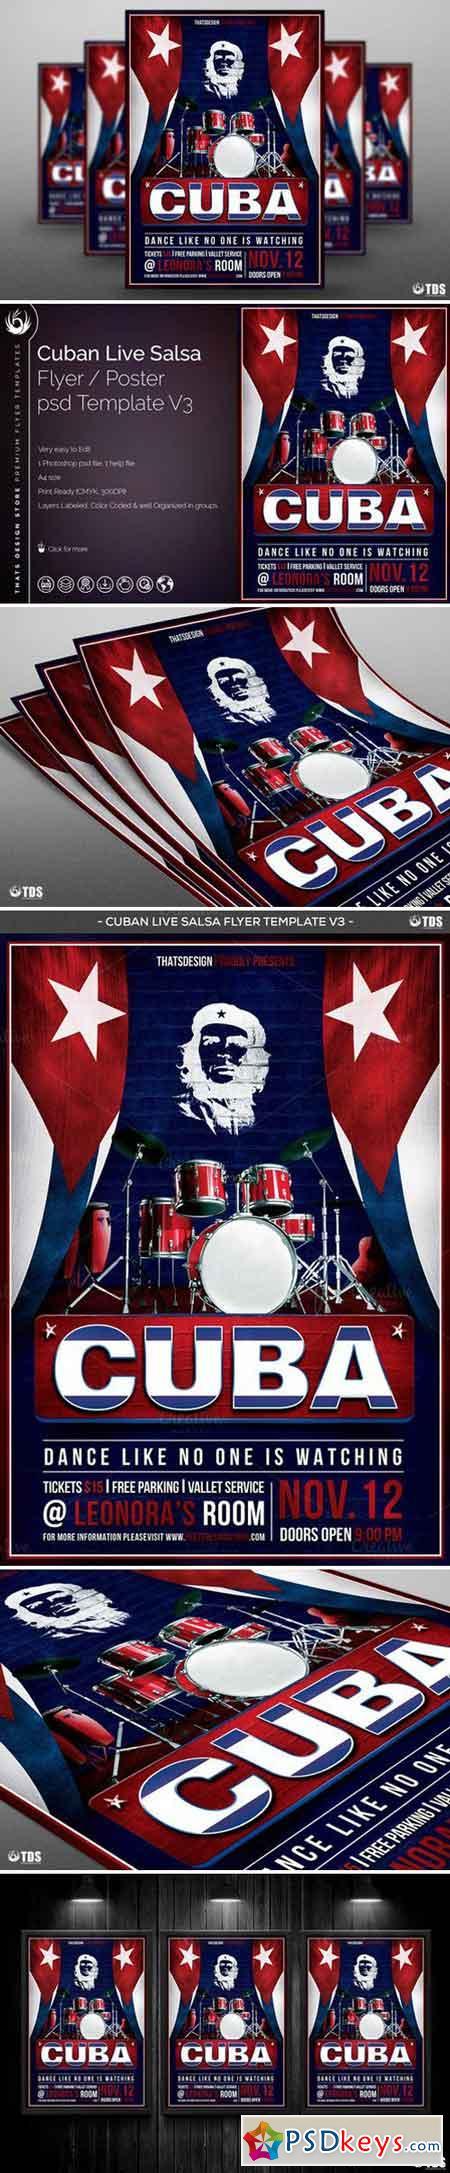 Cuban Live Salsa Flyer Template V3 871673